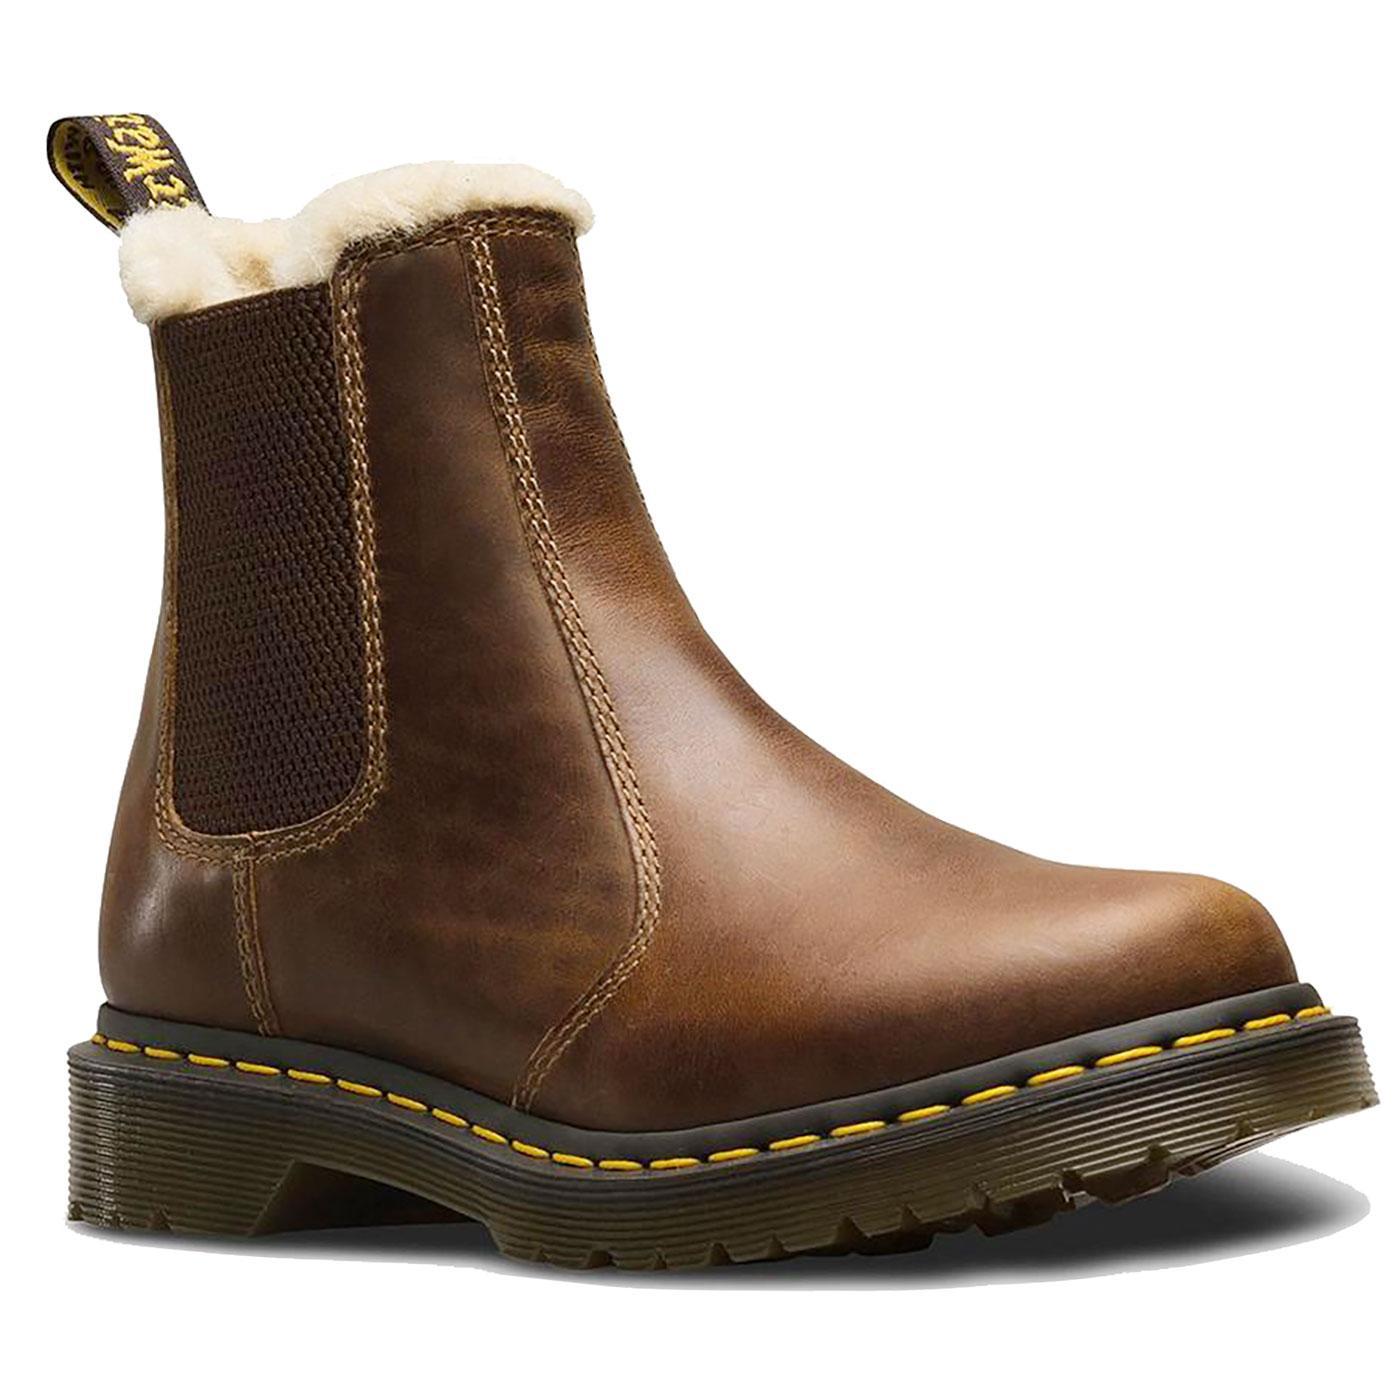 2976 Leonore DR MARTENS Women's Fur Lined Boots